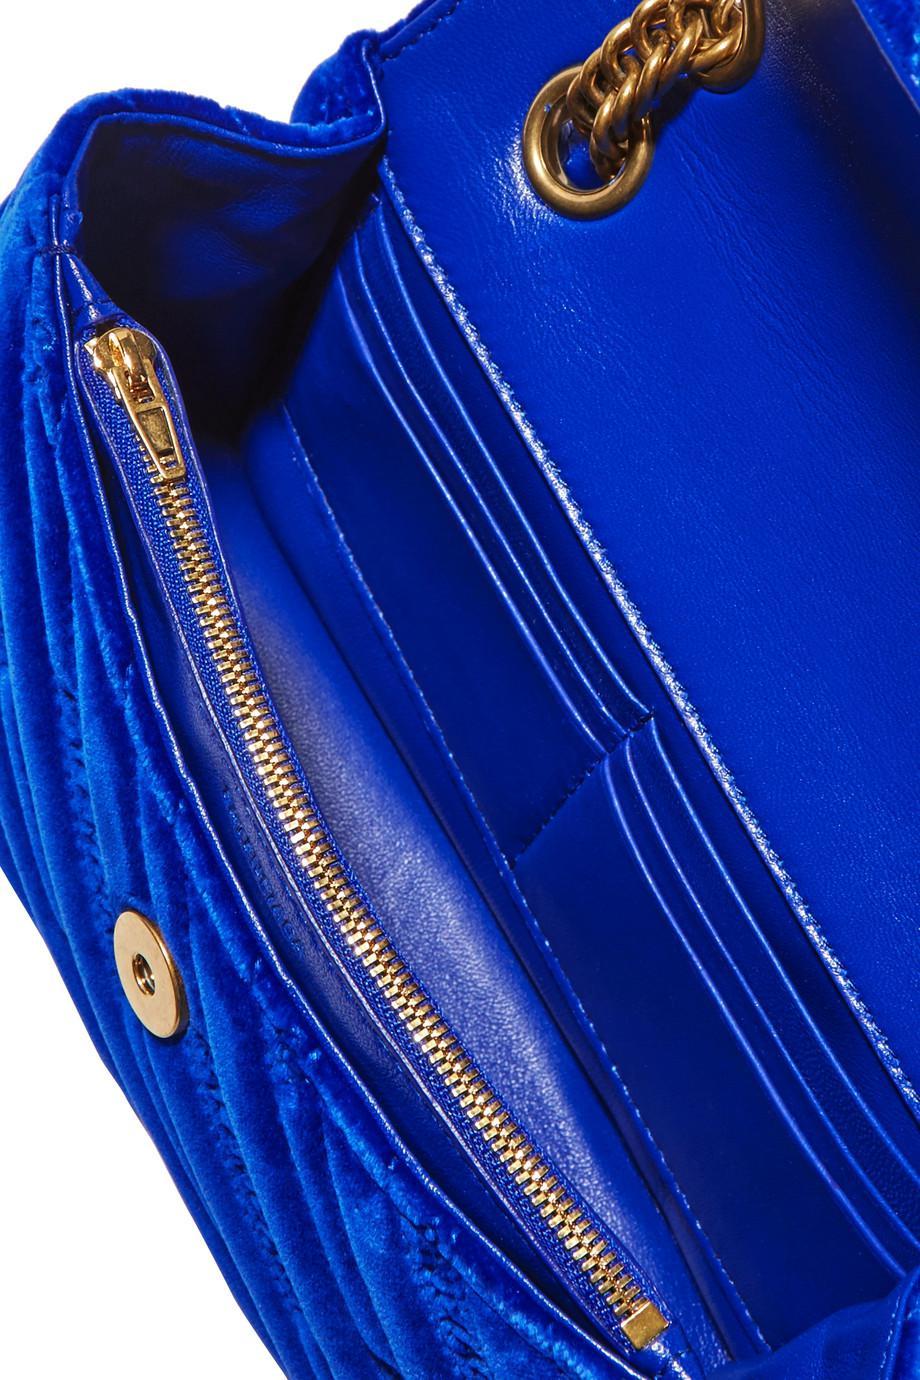 Bb Round Embroidered Quilted Velvet Shoulder Bag - Bright blue Balenciaga Bx1ZGsOX